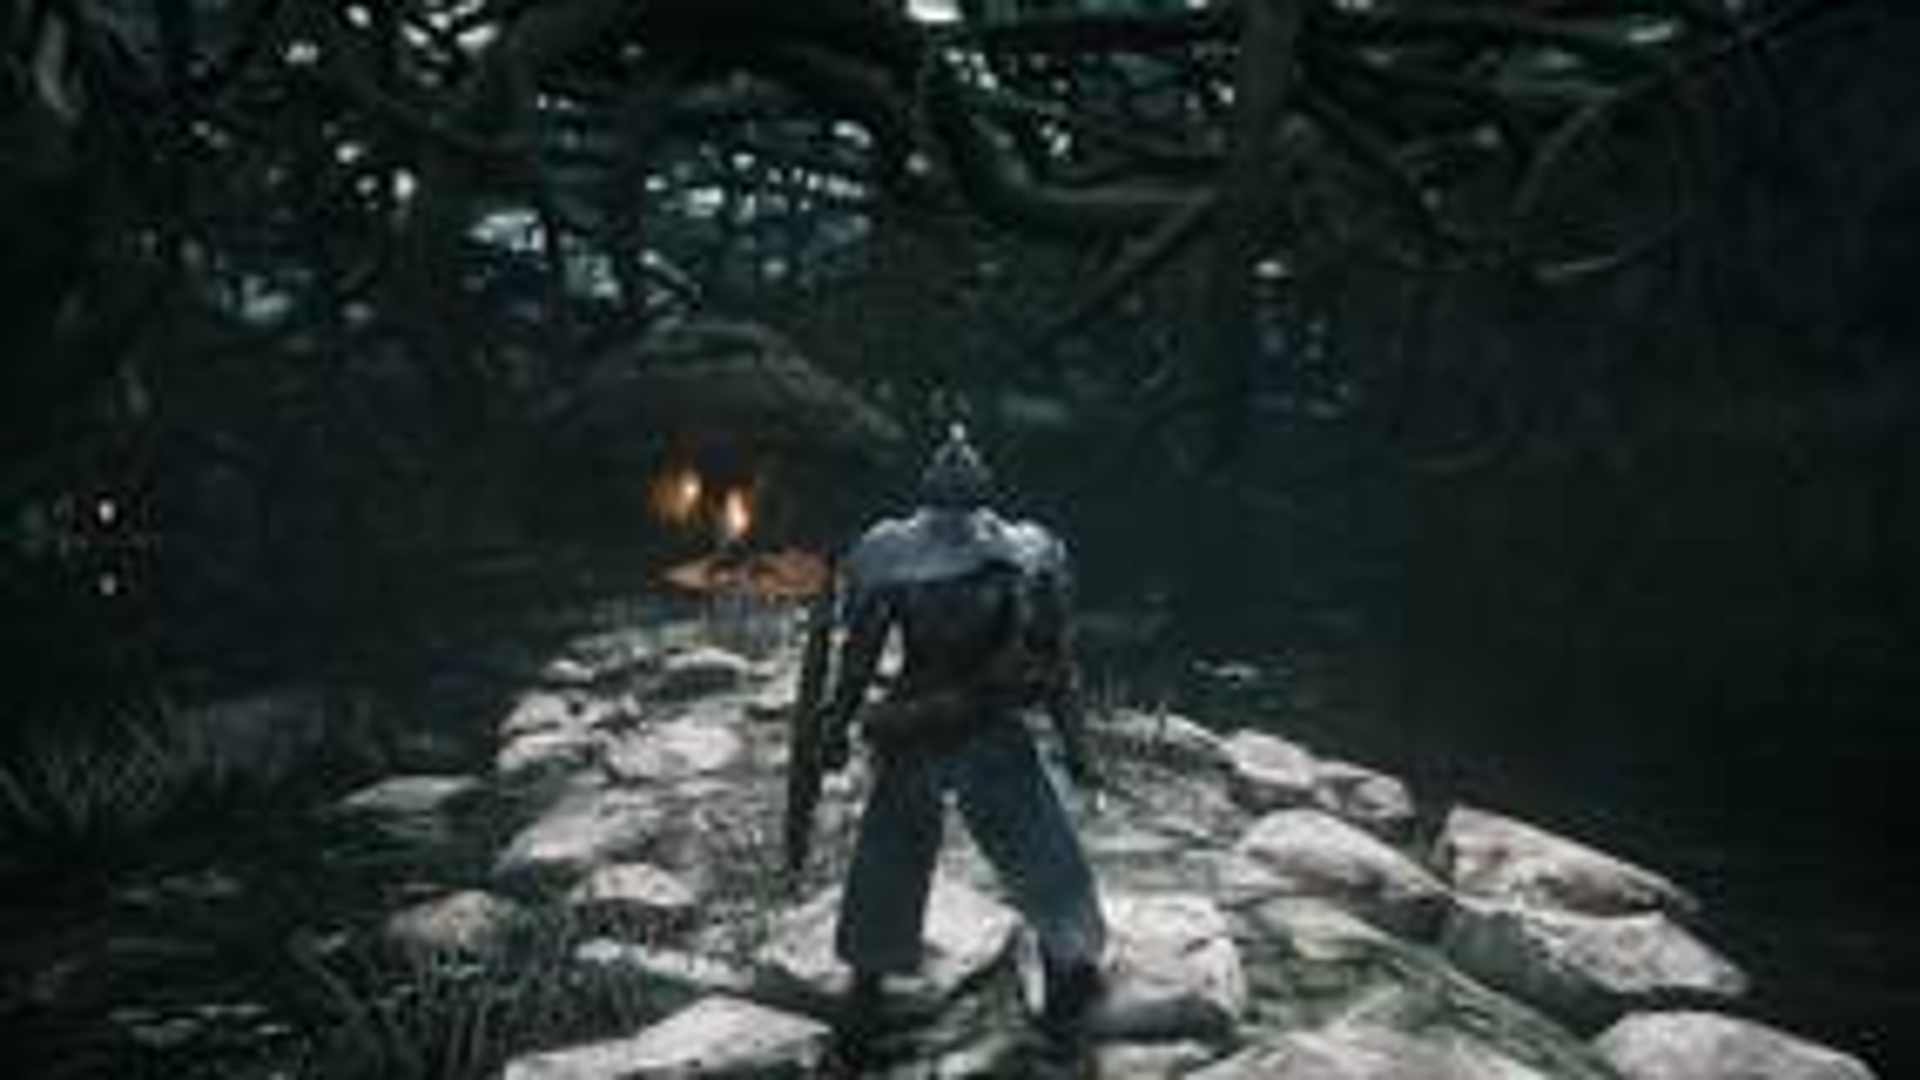 Image for Modder is trying to restore Dark Souls 2's original lighting